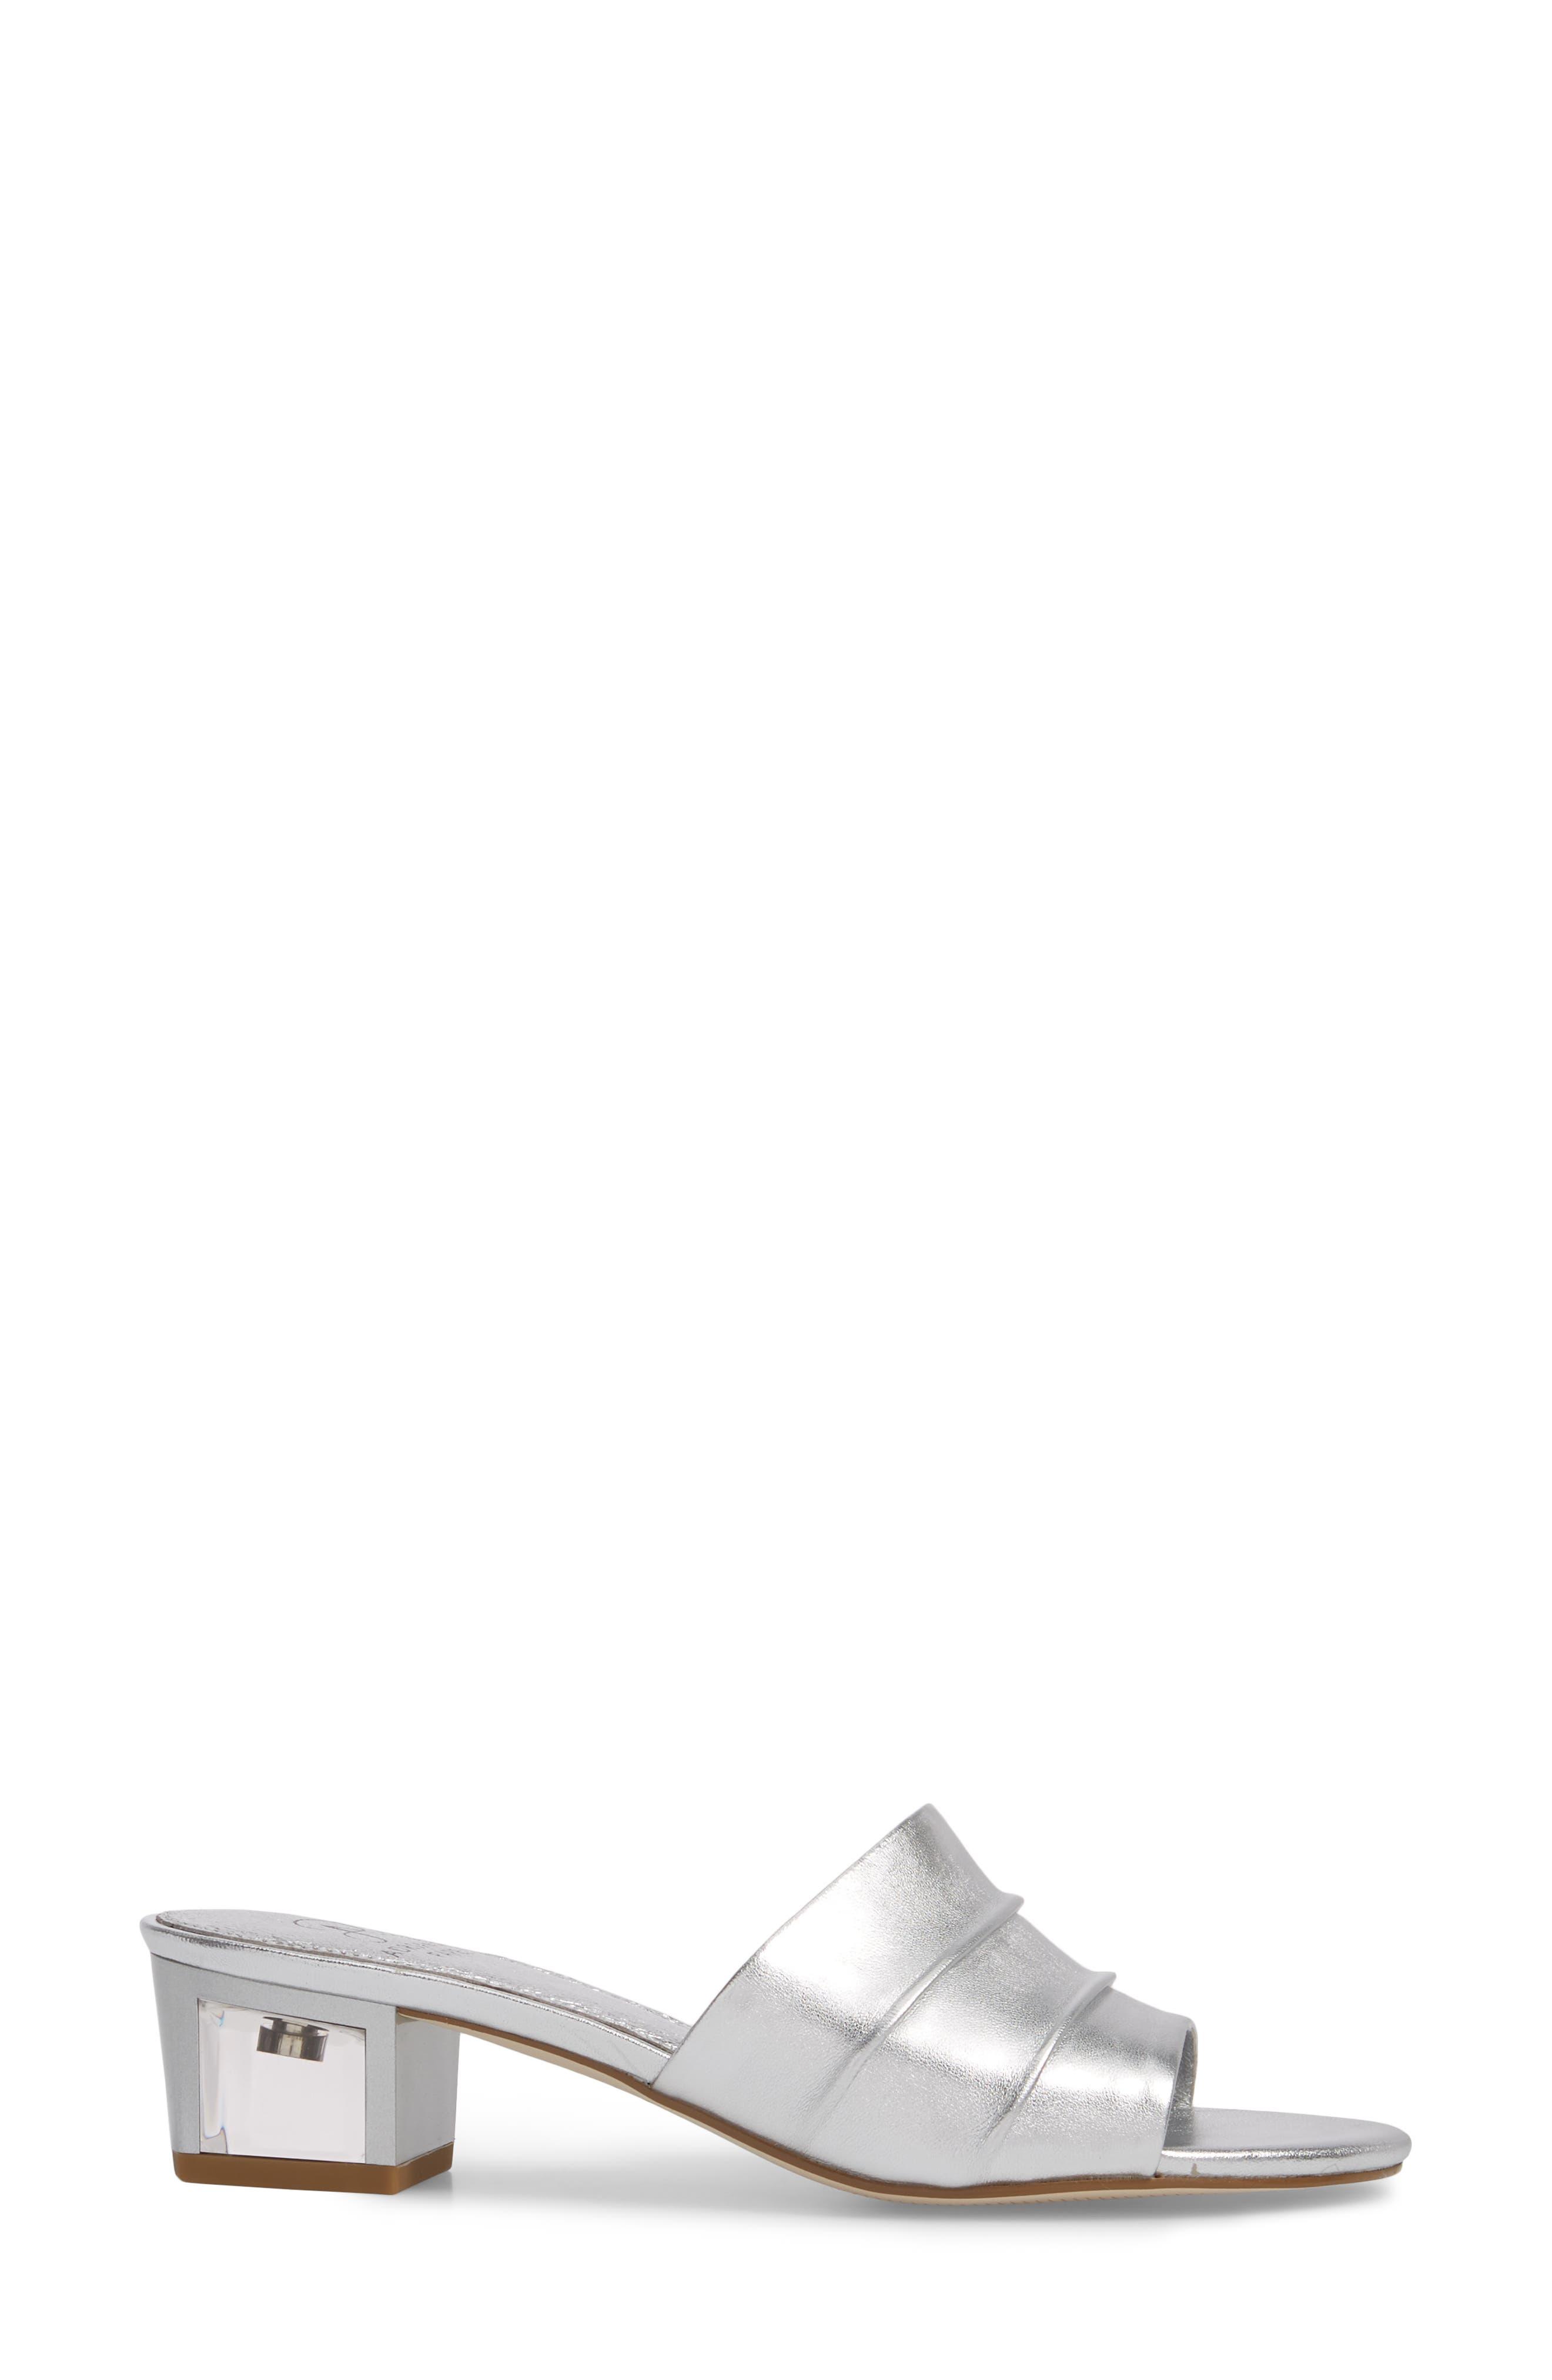 Tiana Block Heel Slide Sandal,                             Alternate thumbnail 3, color,                             SILVER LEATHER